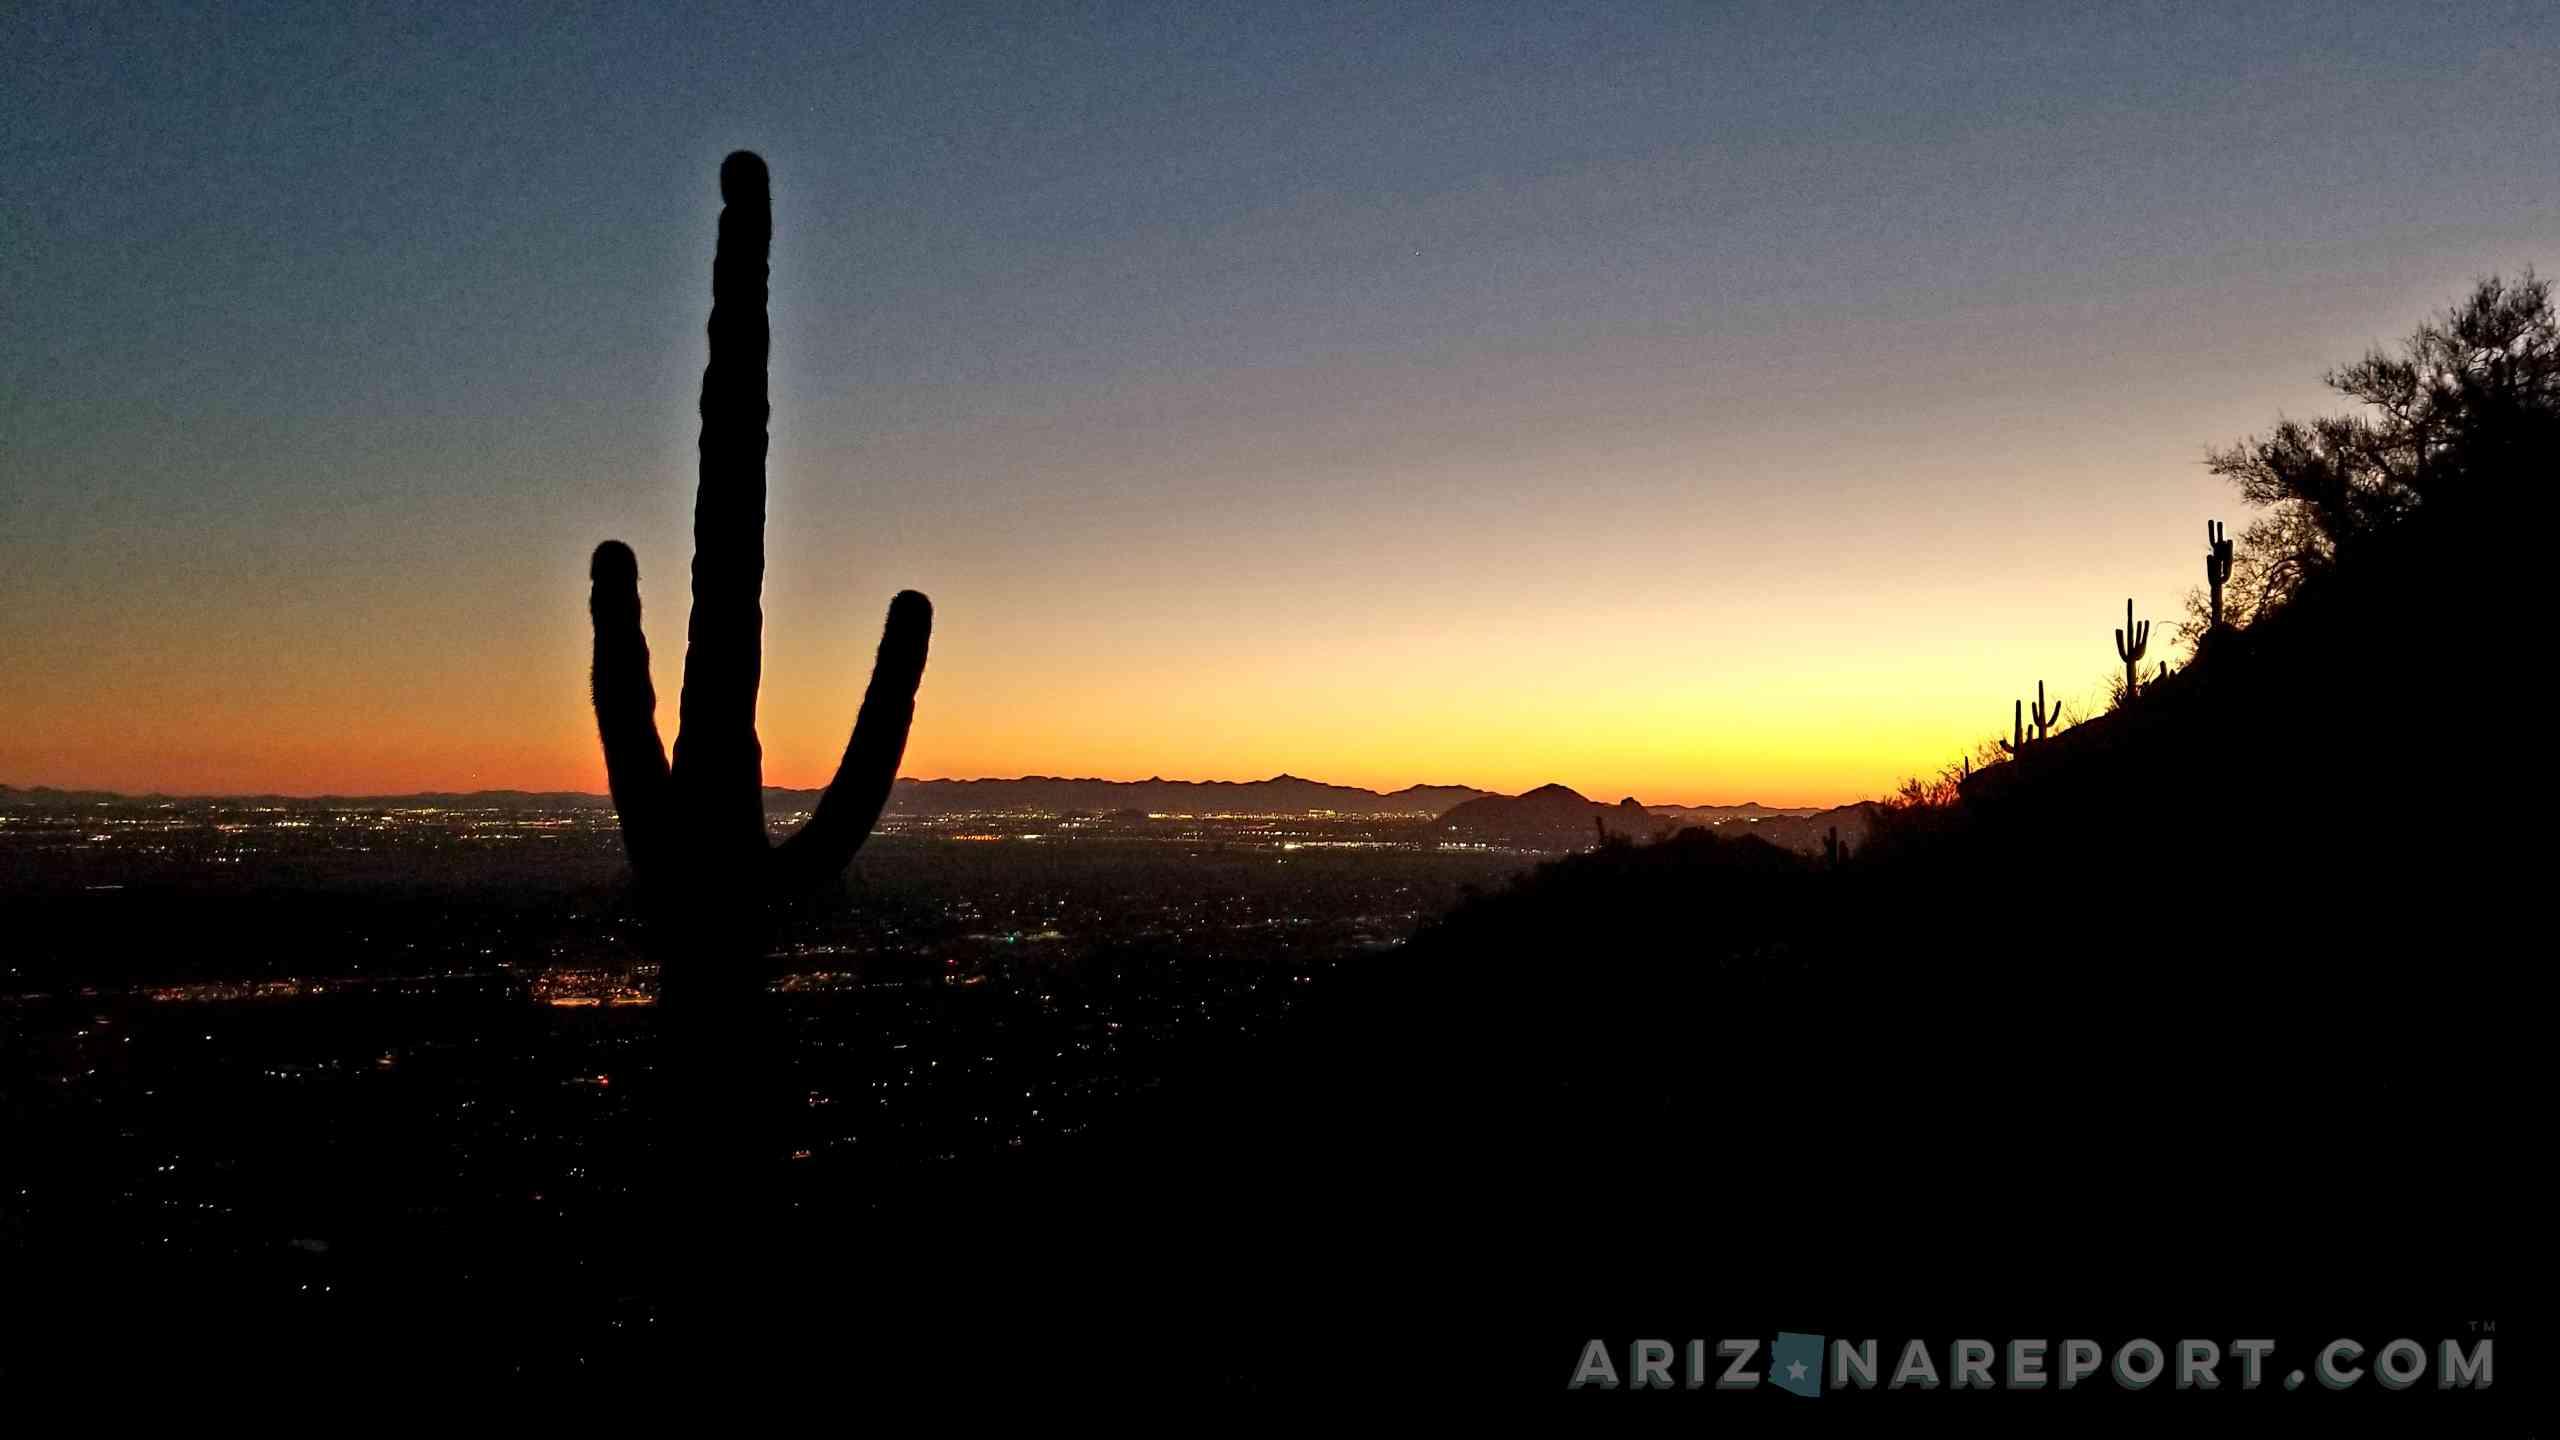 Sunrise Peak Trail Scottsdale Fountain Hills Arizona trail hiking cactus sunset